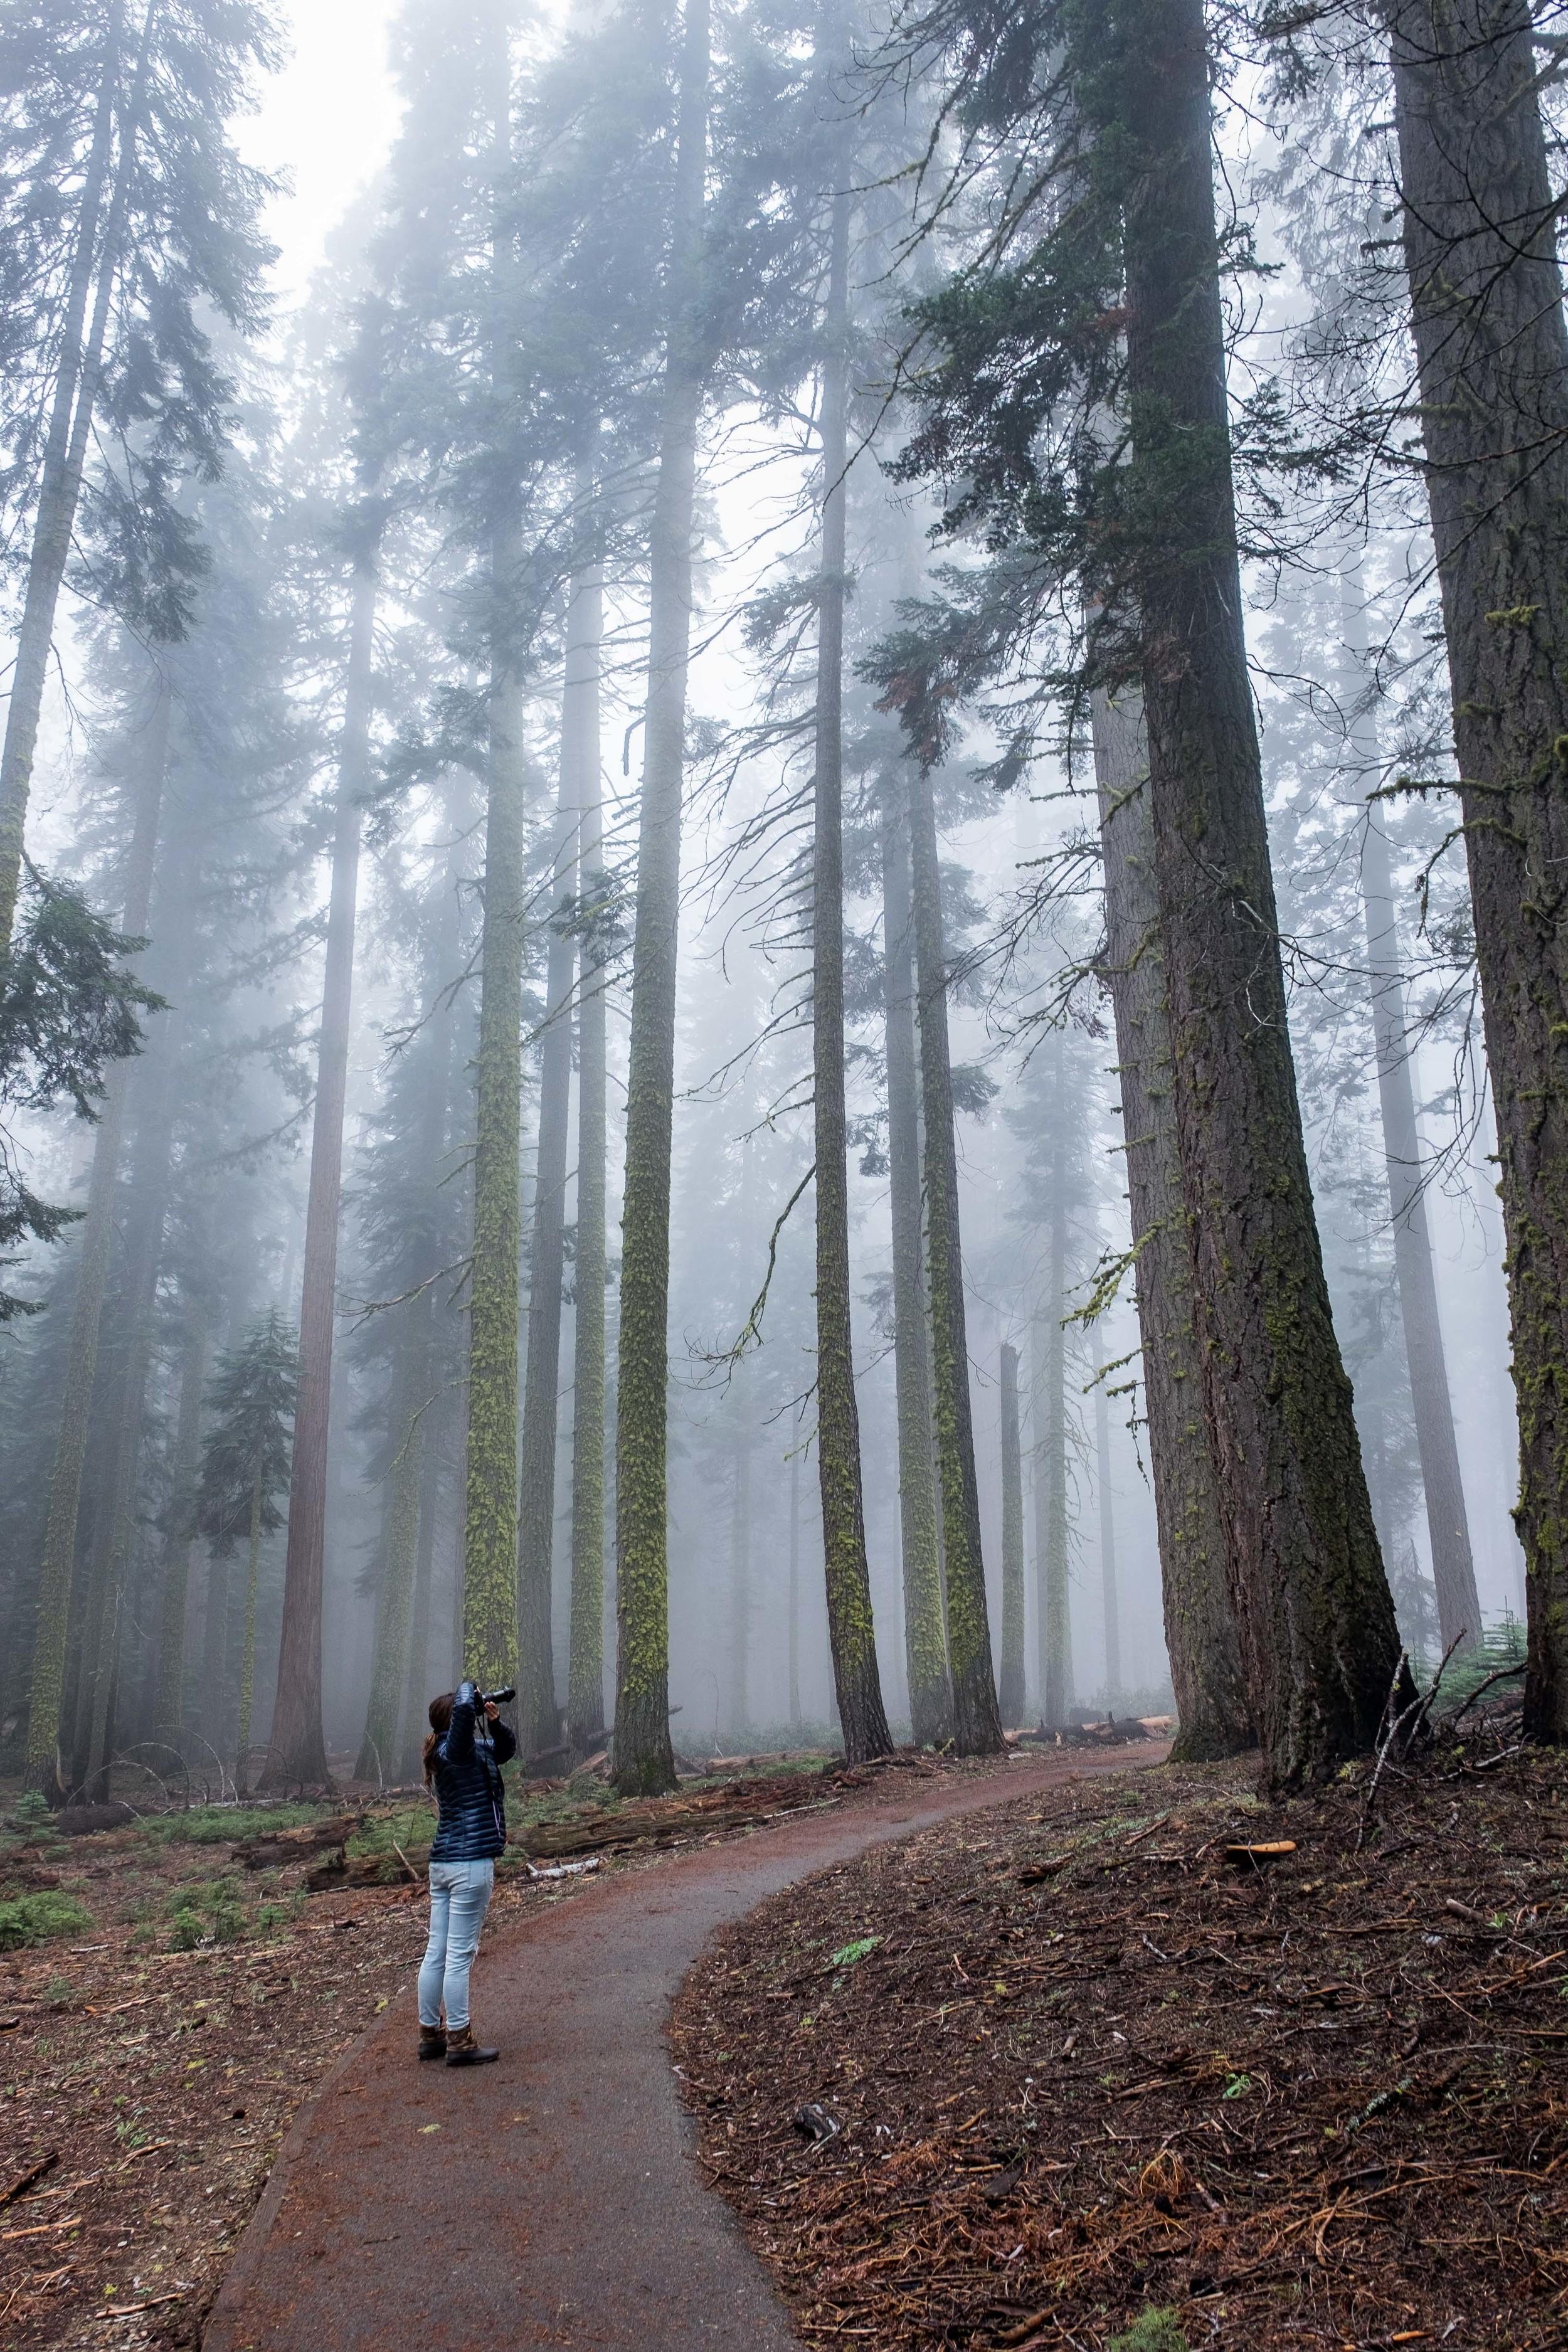 20160508-JI-Sequoia National Park-_DSF9761.jpg